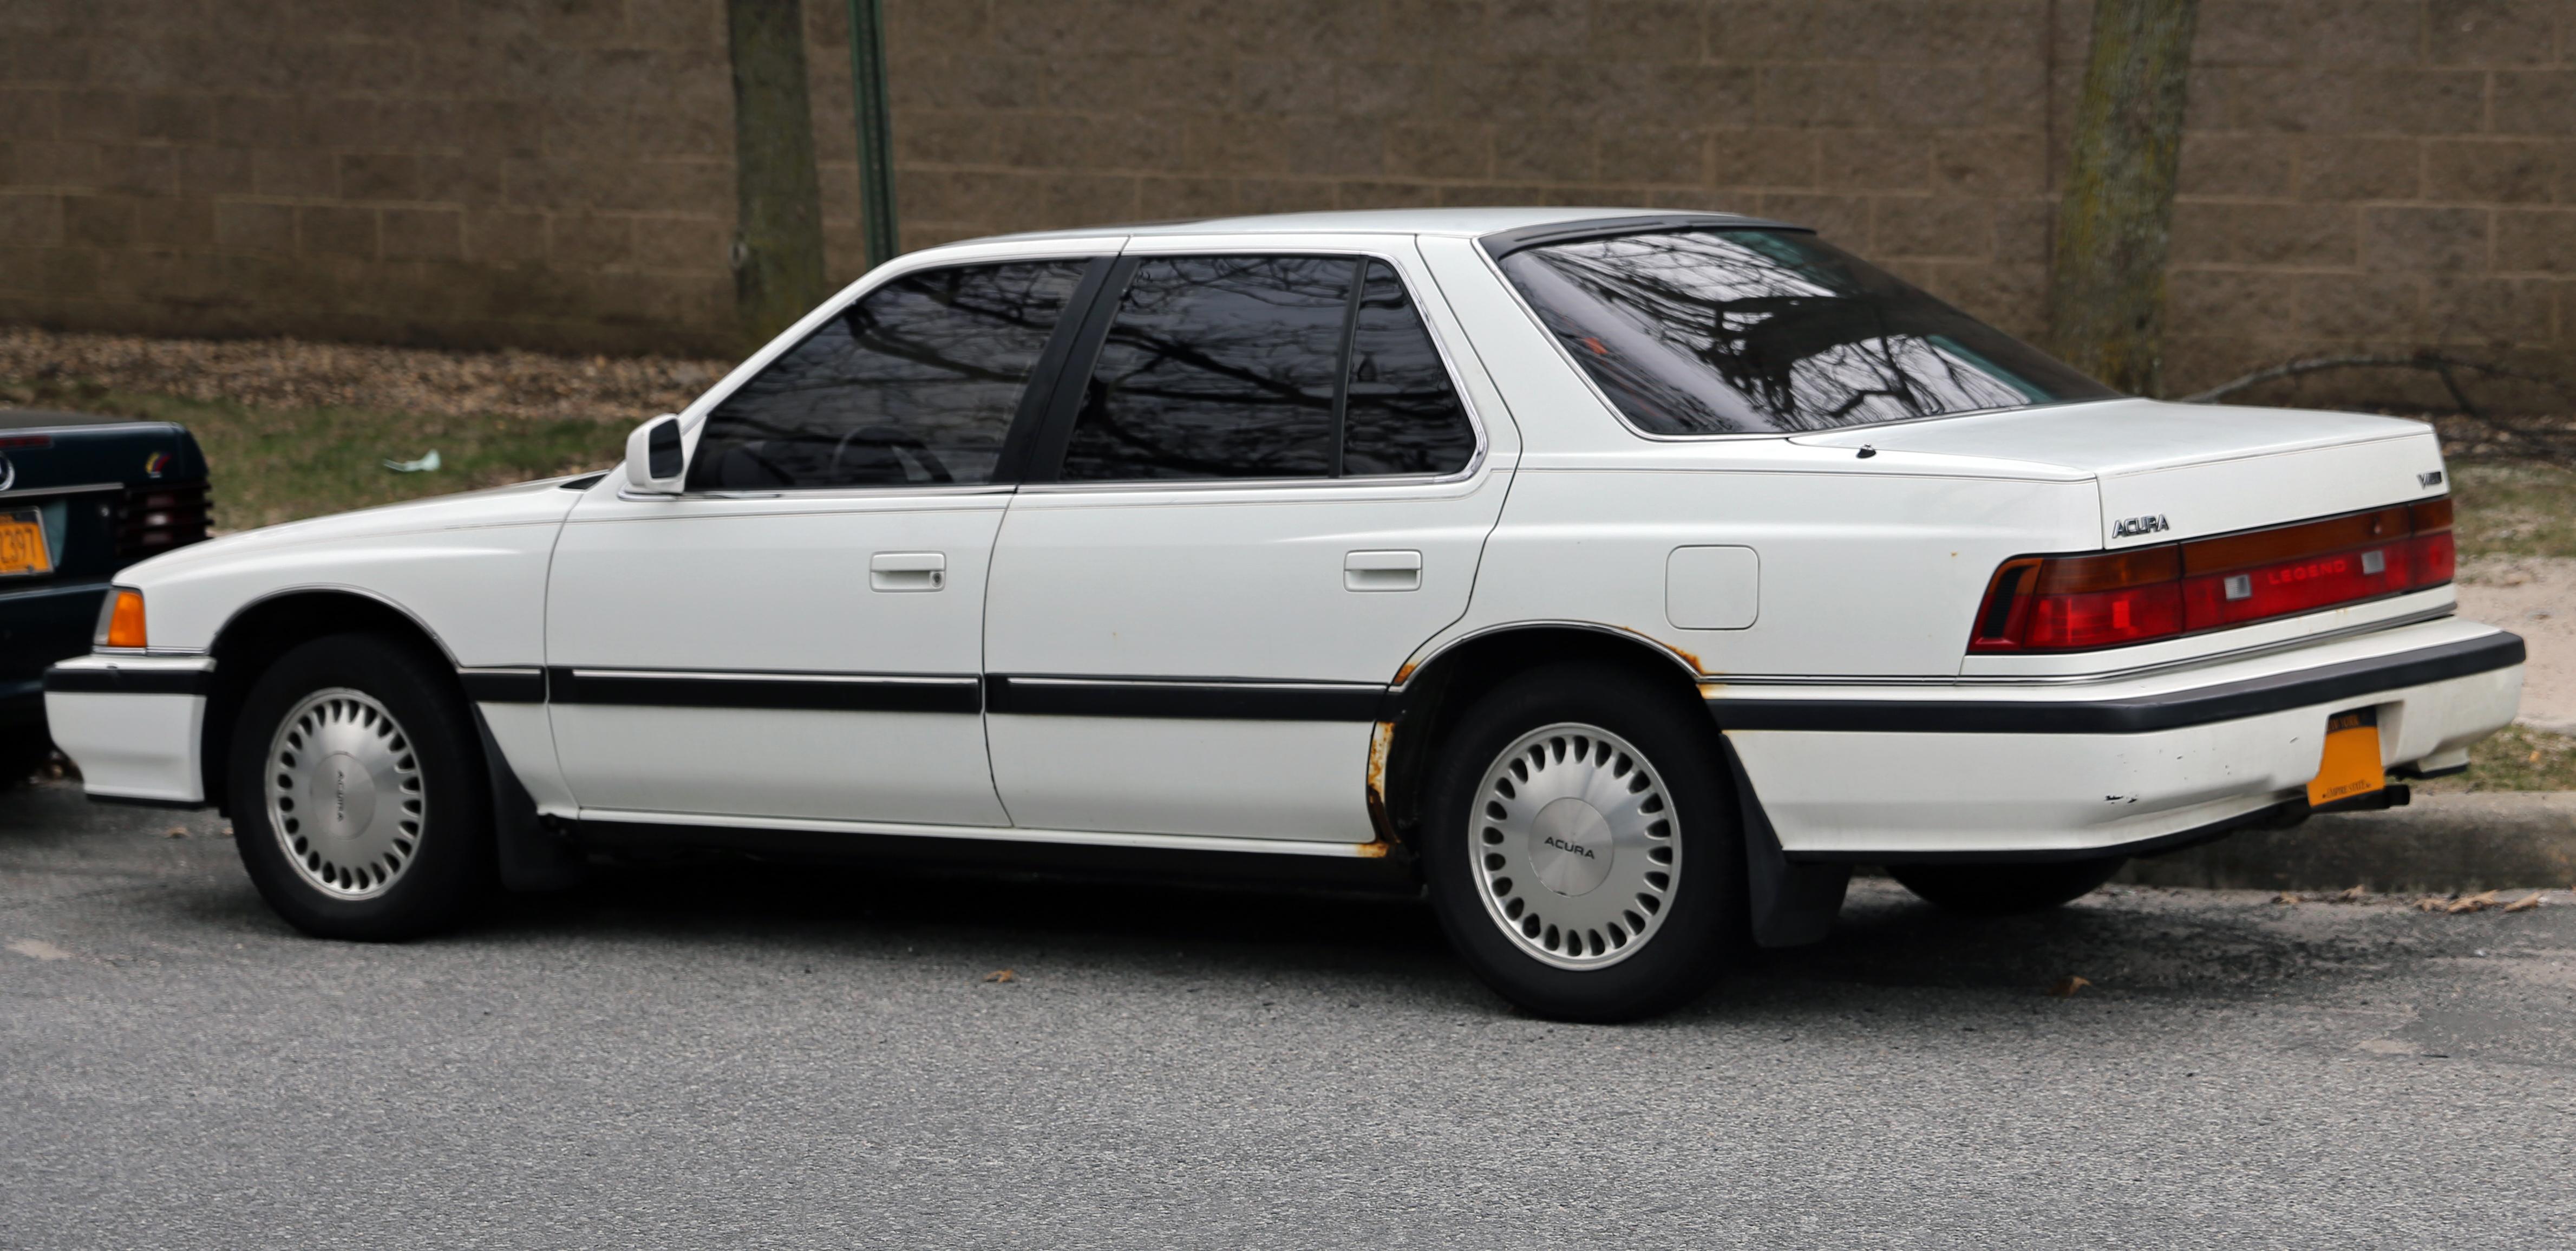 acura legend i 1986 1990 sedan outstanding cars rh carsot com 1997 Acura Legend 1992 Acura Legend